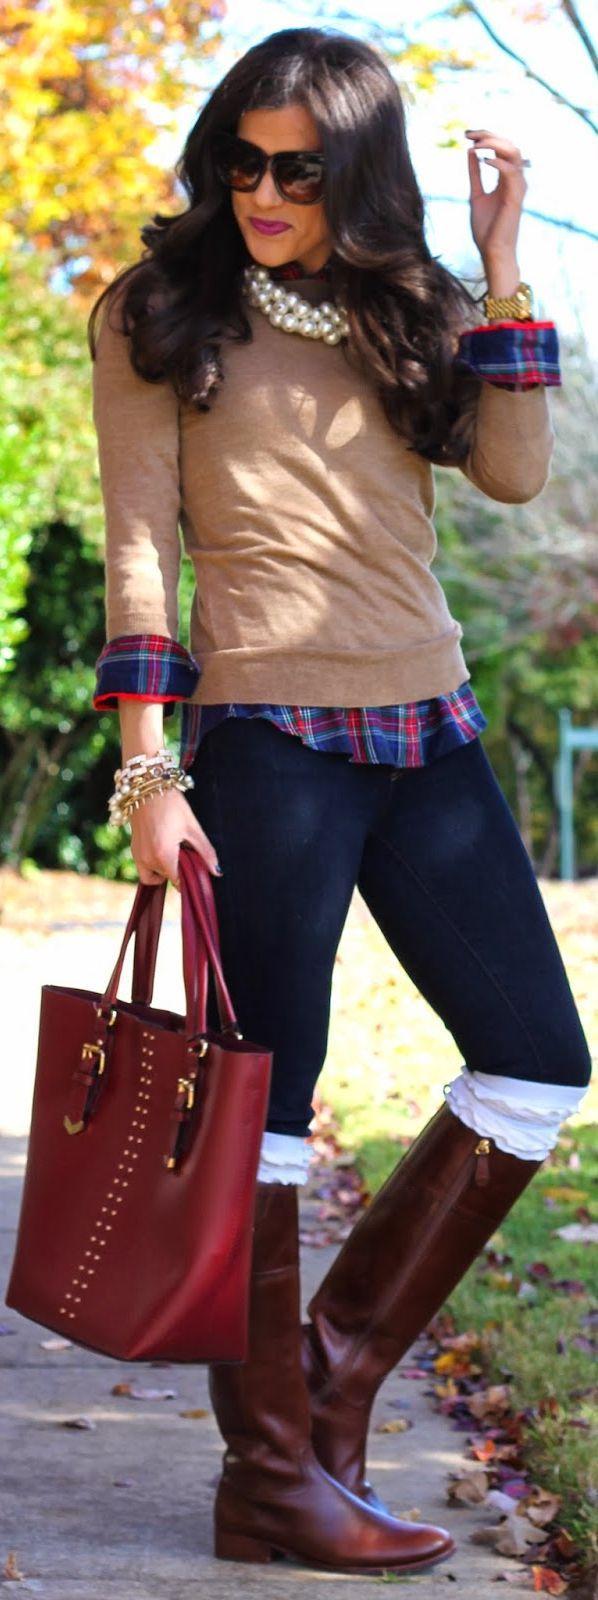 Leggings, plaid, legwarmers .....great outfit